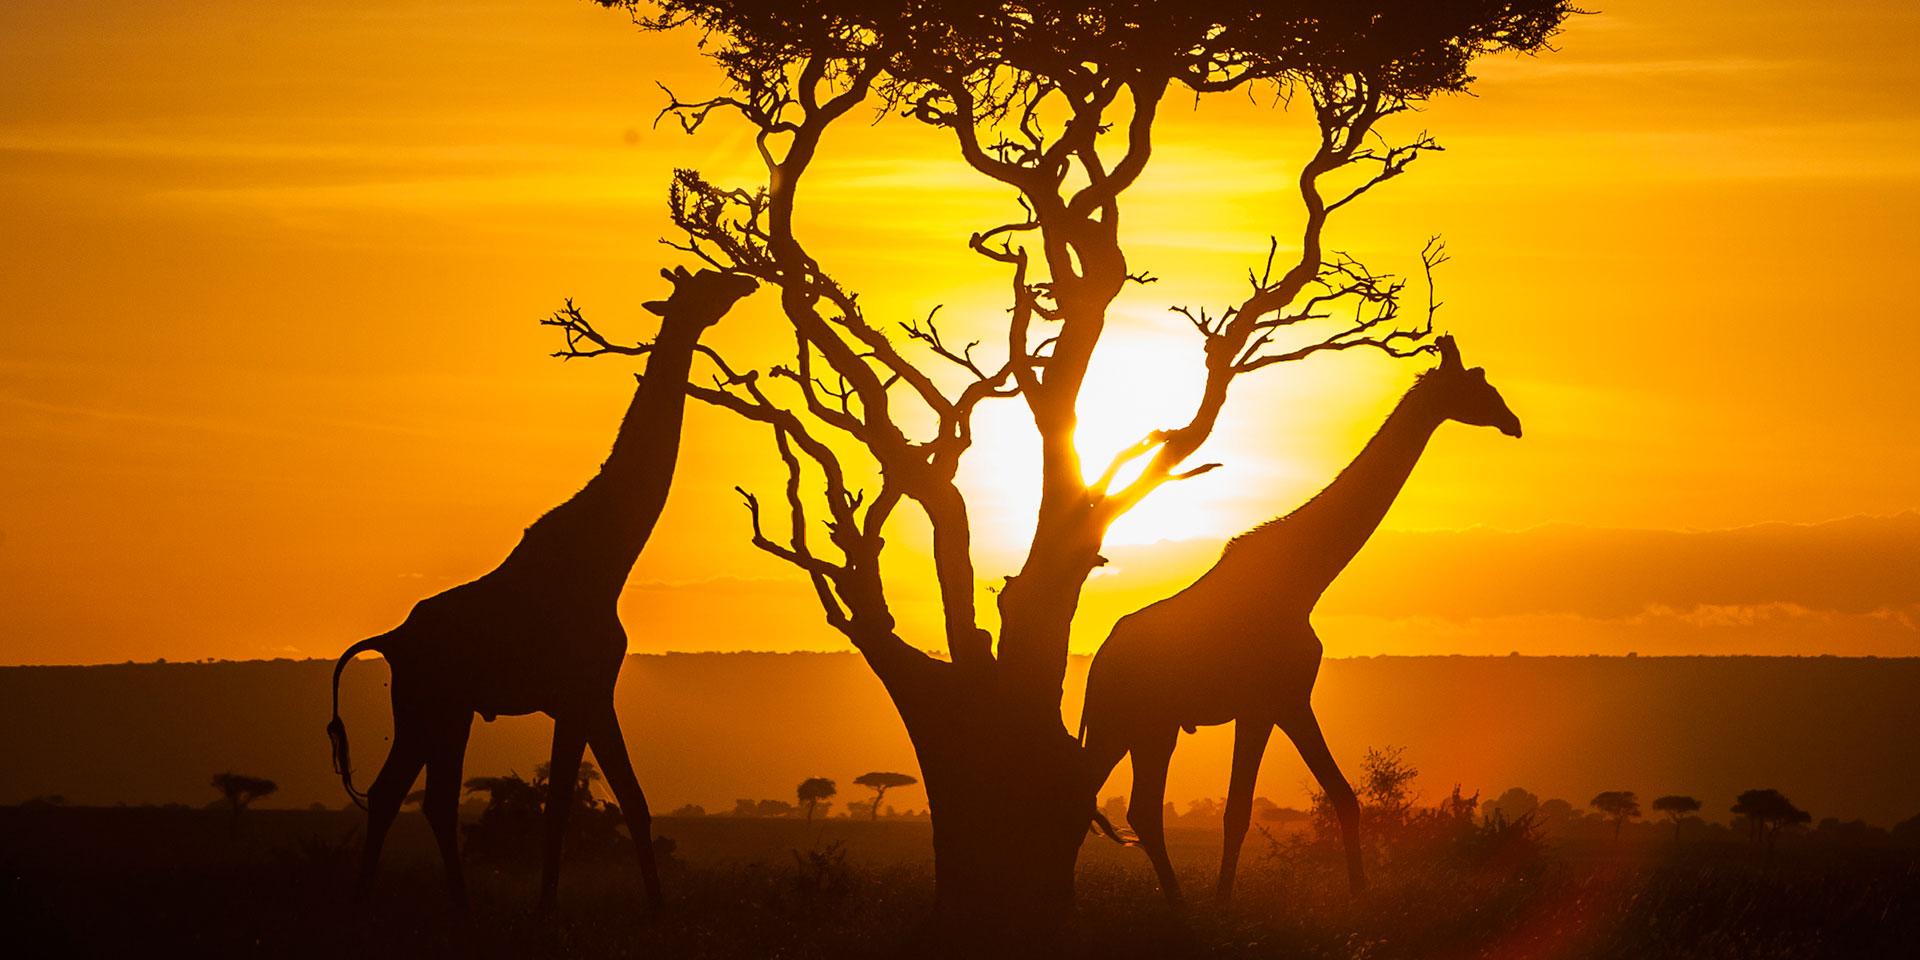 kenya-une-destination-qui-tient-ses-promesses